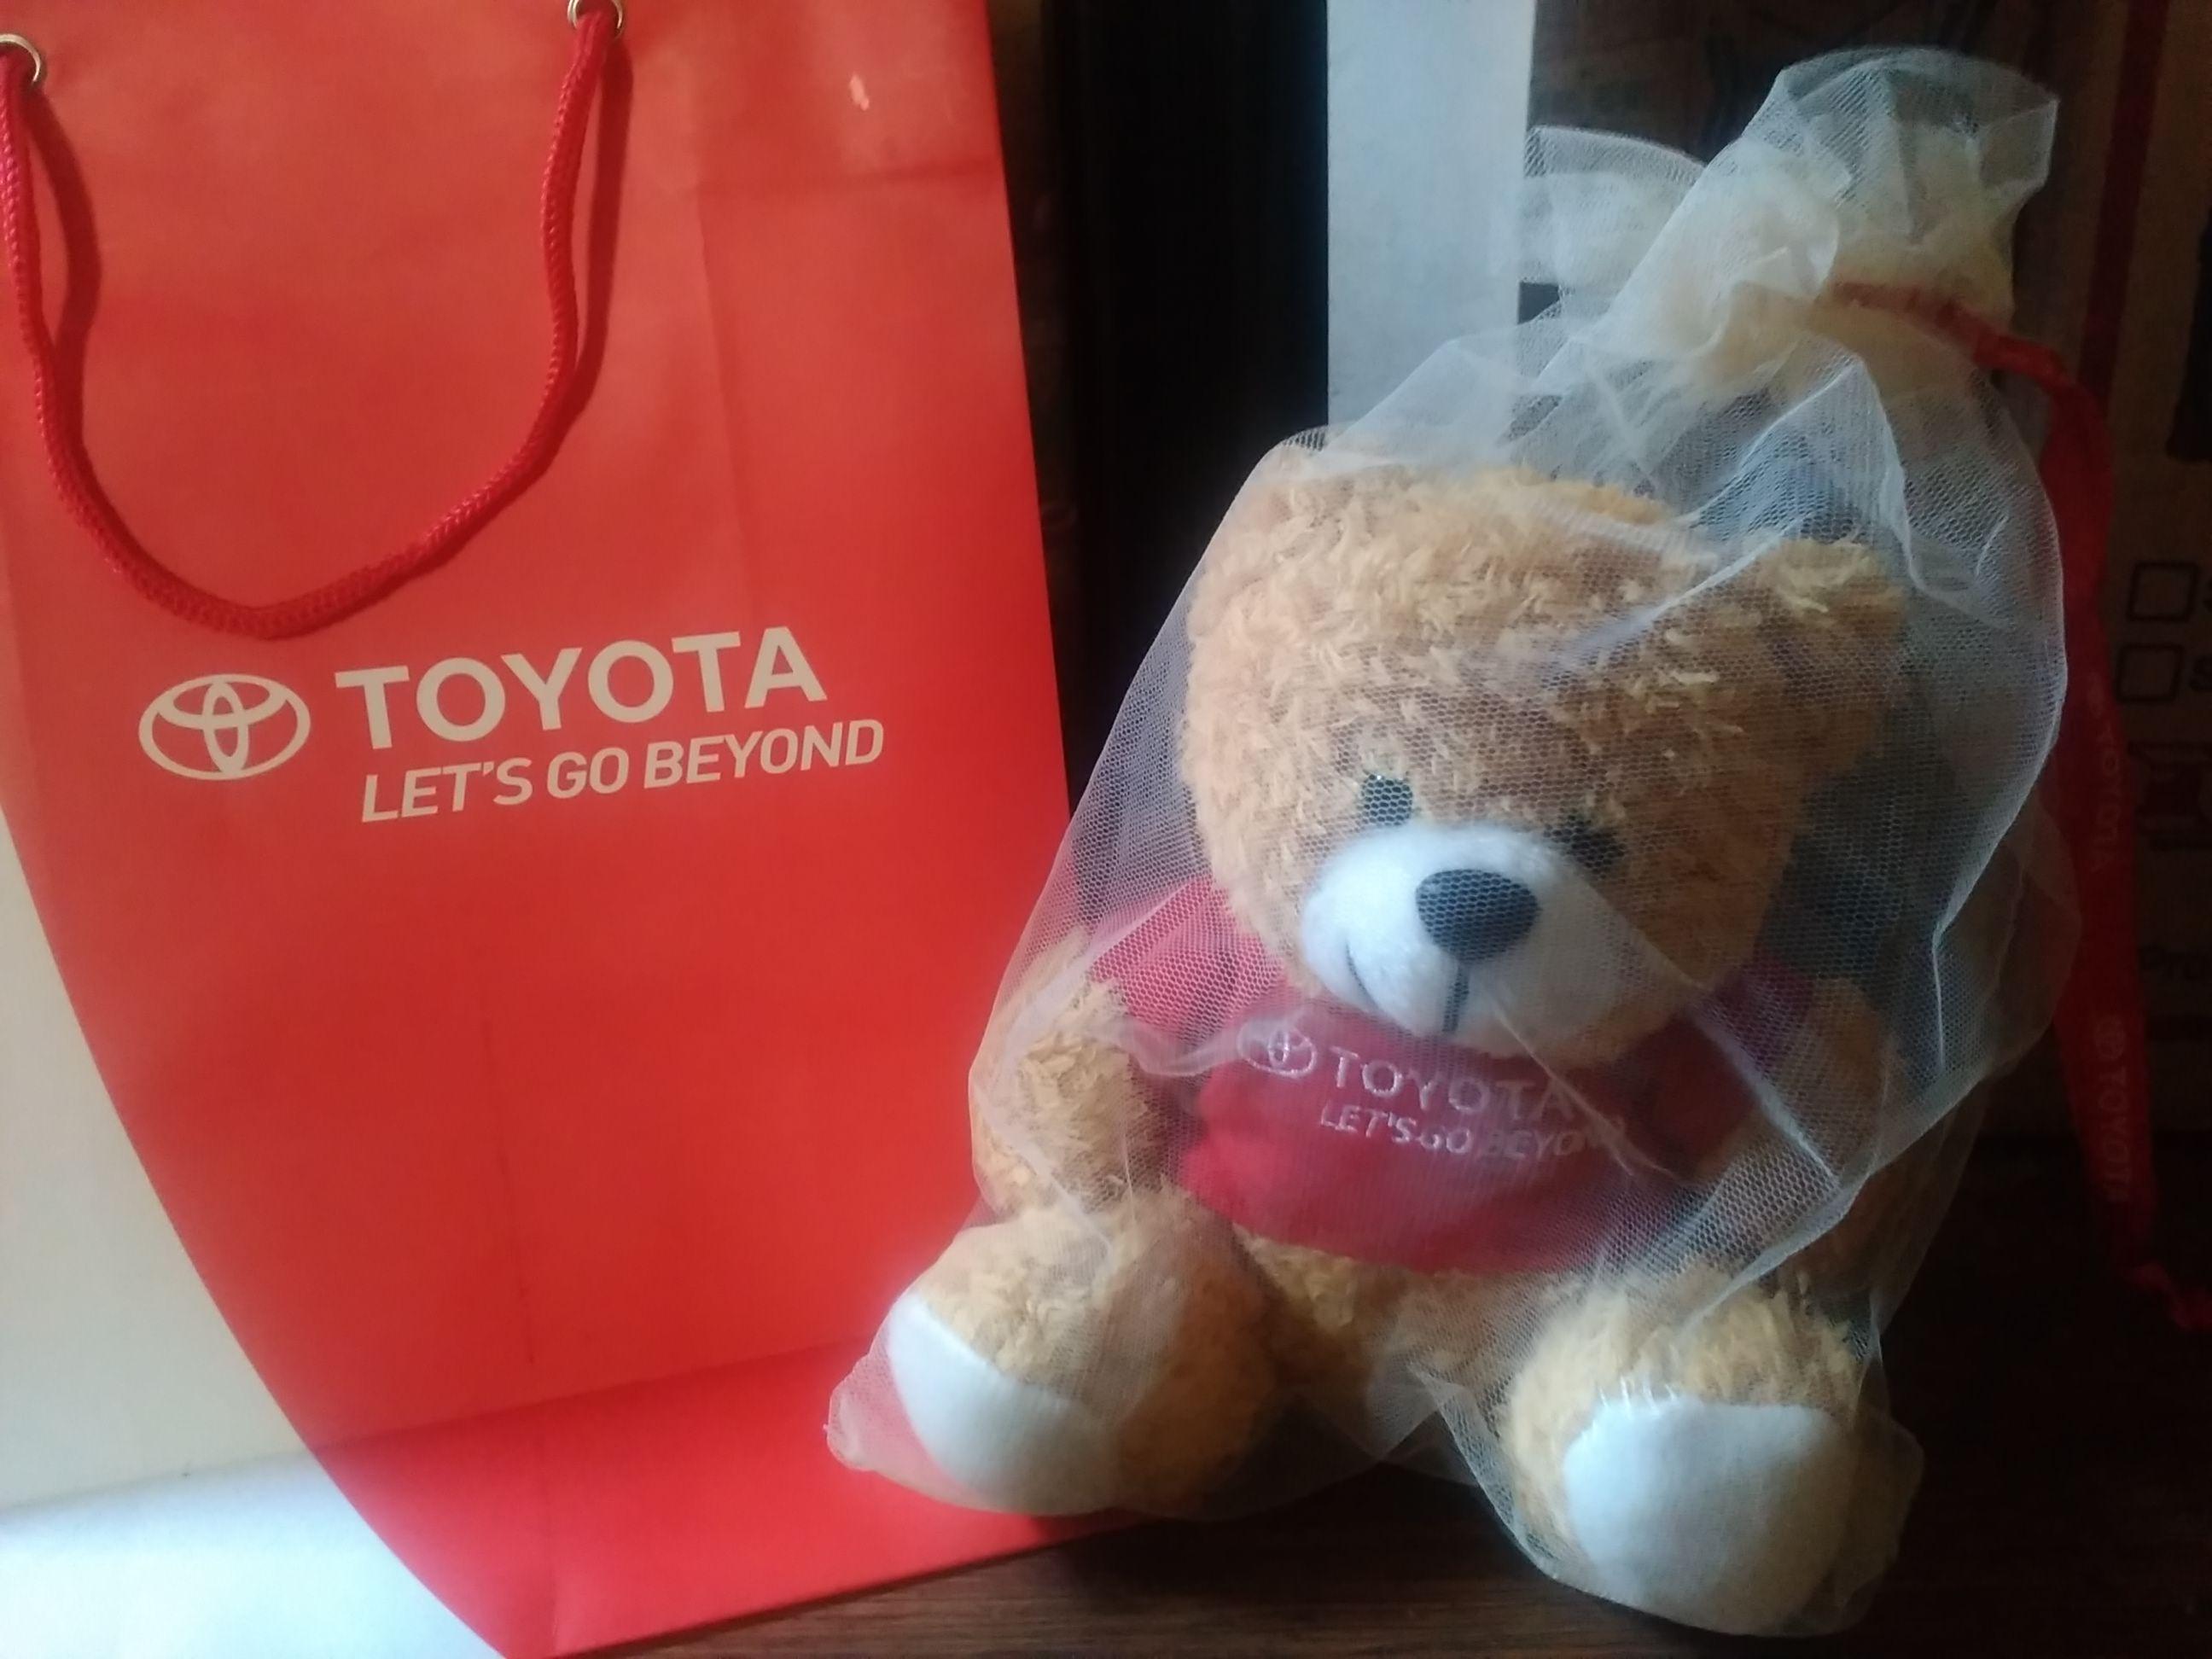 Foto souvenir berupa boneka beruang bertuliskan logo TOYOTA yang konon stok terbatas (dokpri)